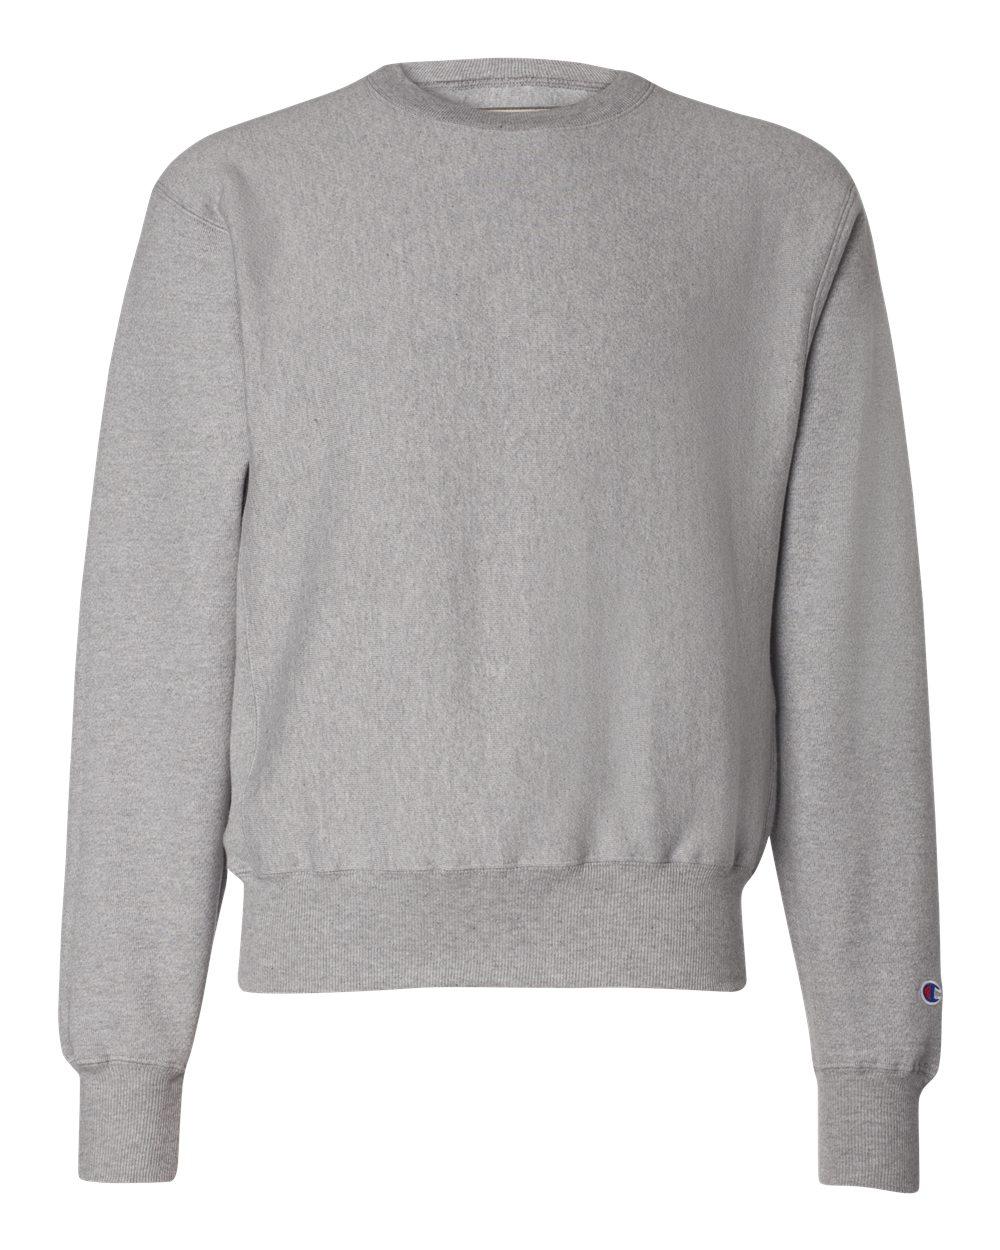 Champion-Mens-Reverse-Weave-Crewneck-Sweatshirt-Blank-Solid-S149-up-to-3XL thumbnail 12